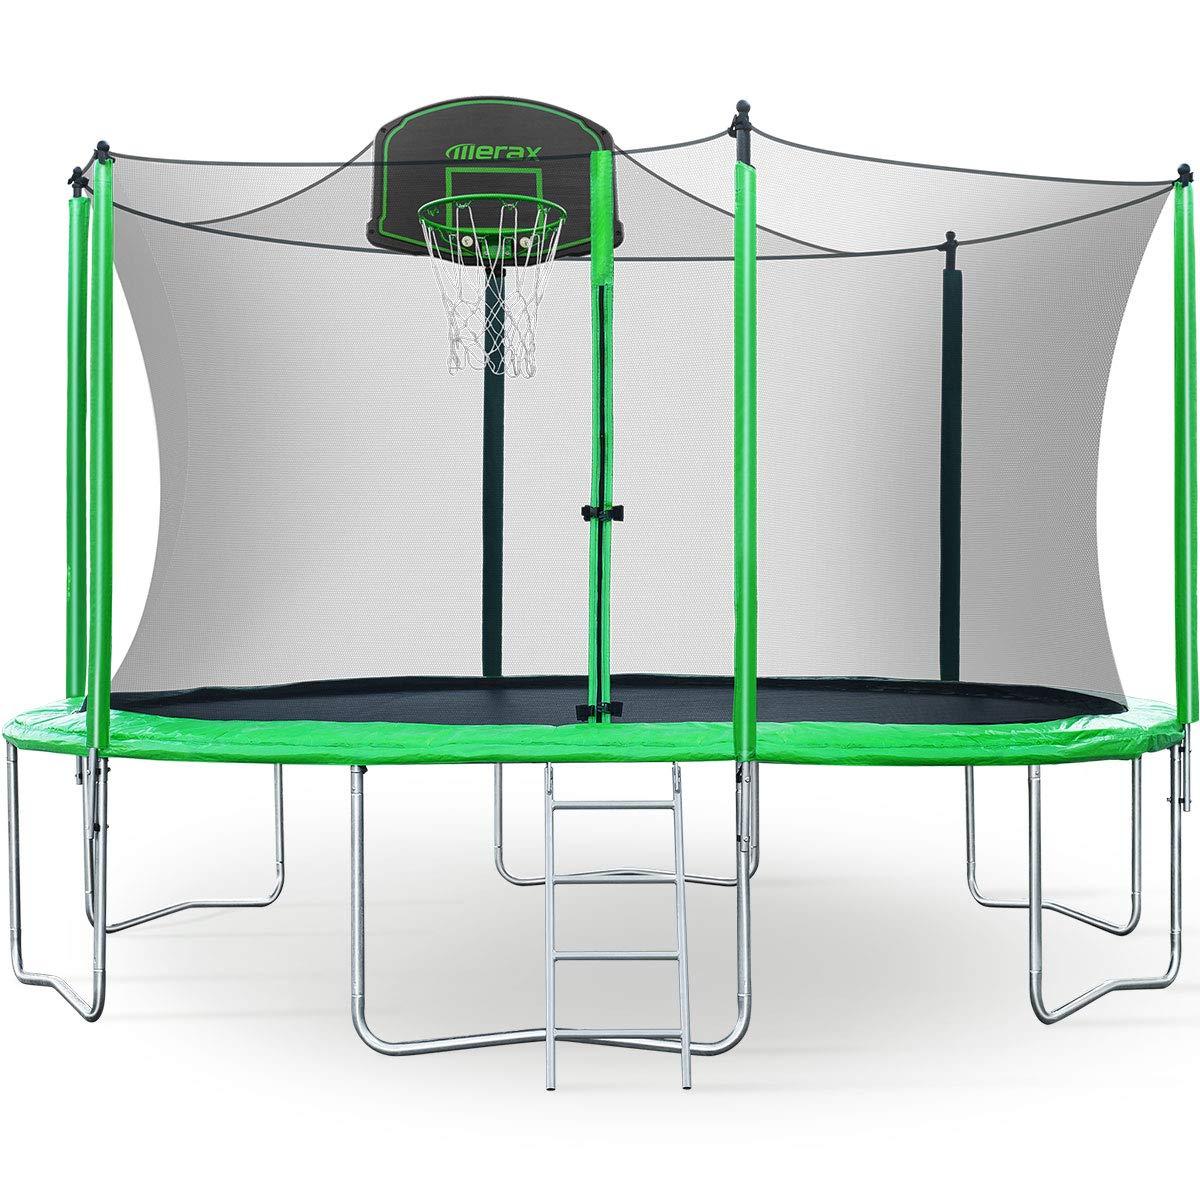 Merax Trampoline Safety Enclosure Basketball